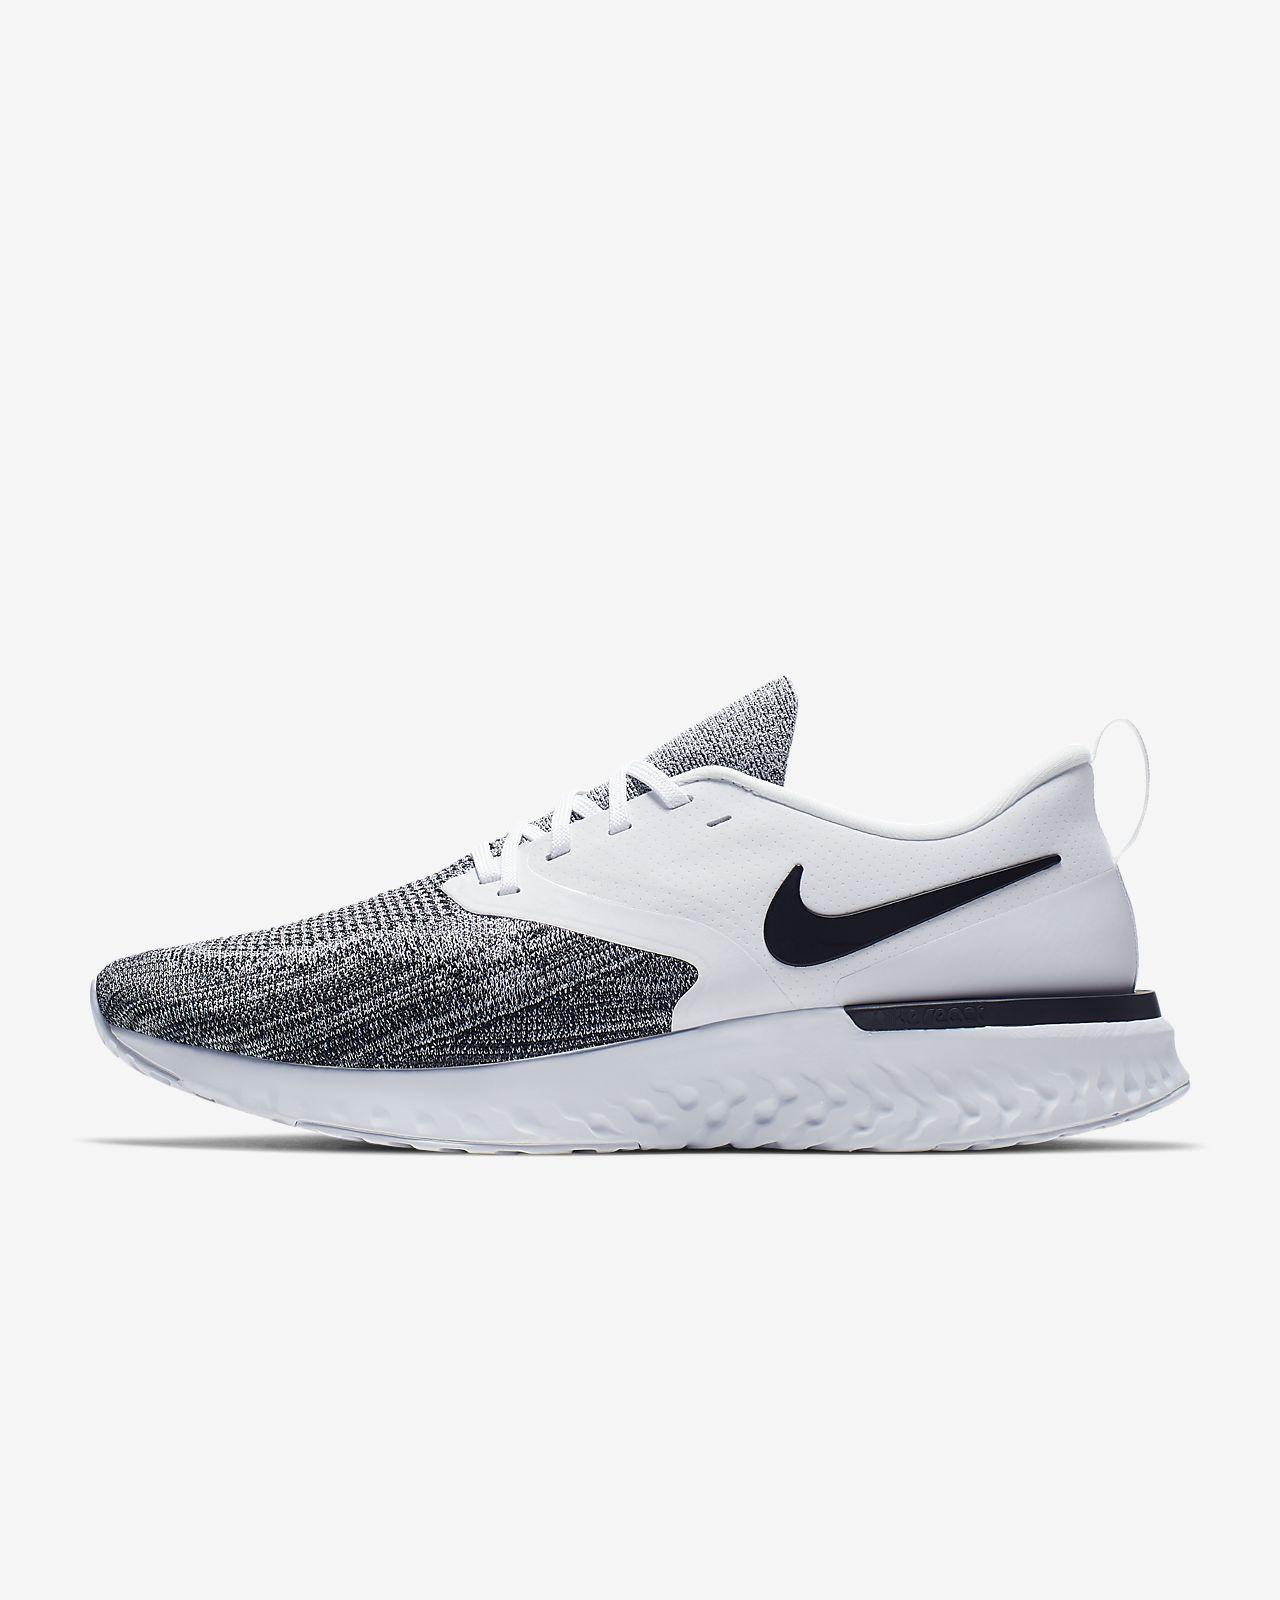 1448a8eb2e Nike Odyssey React Flyknit 2 Men's Running Shoe